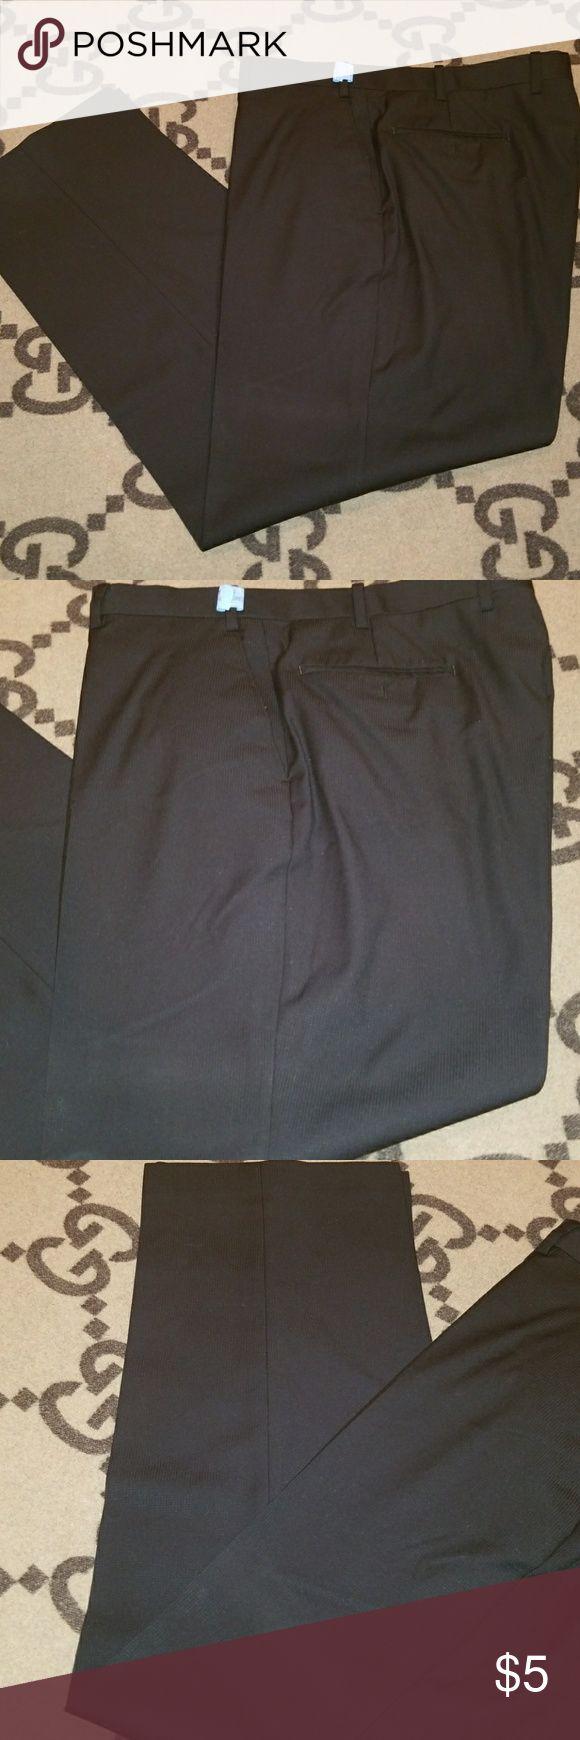 Sean John dress pants Black Sean John dress pants. Fairly certain they are a 36 waist and measured at a 32 length. 36x32. Sean John tends to run big. Sean John Pants Dress